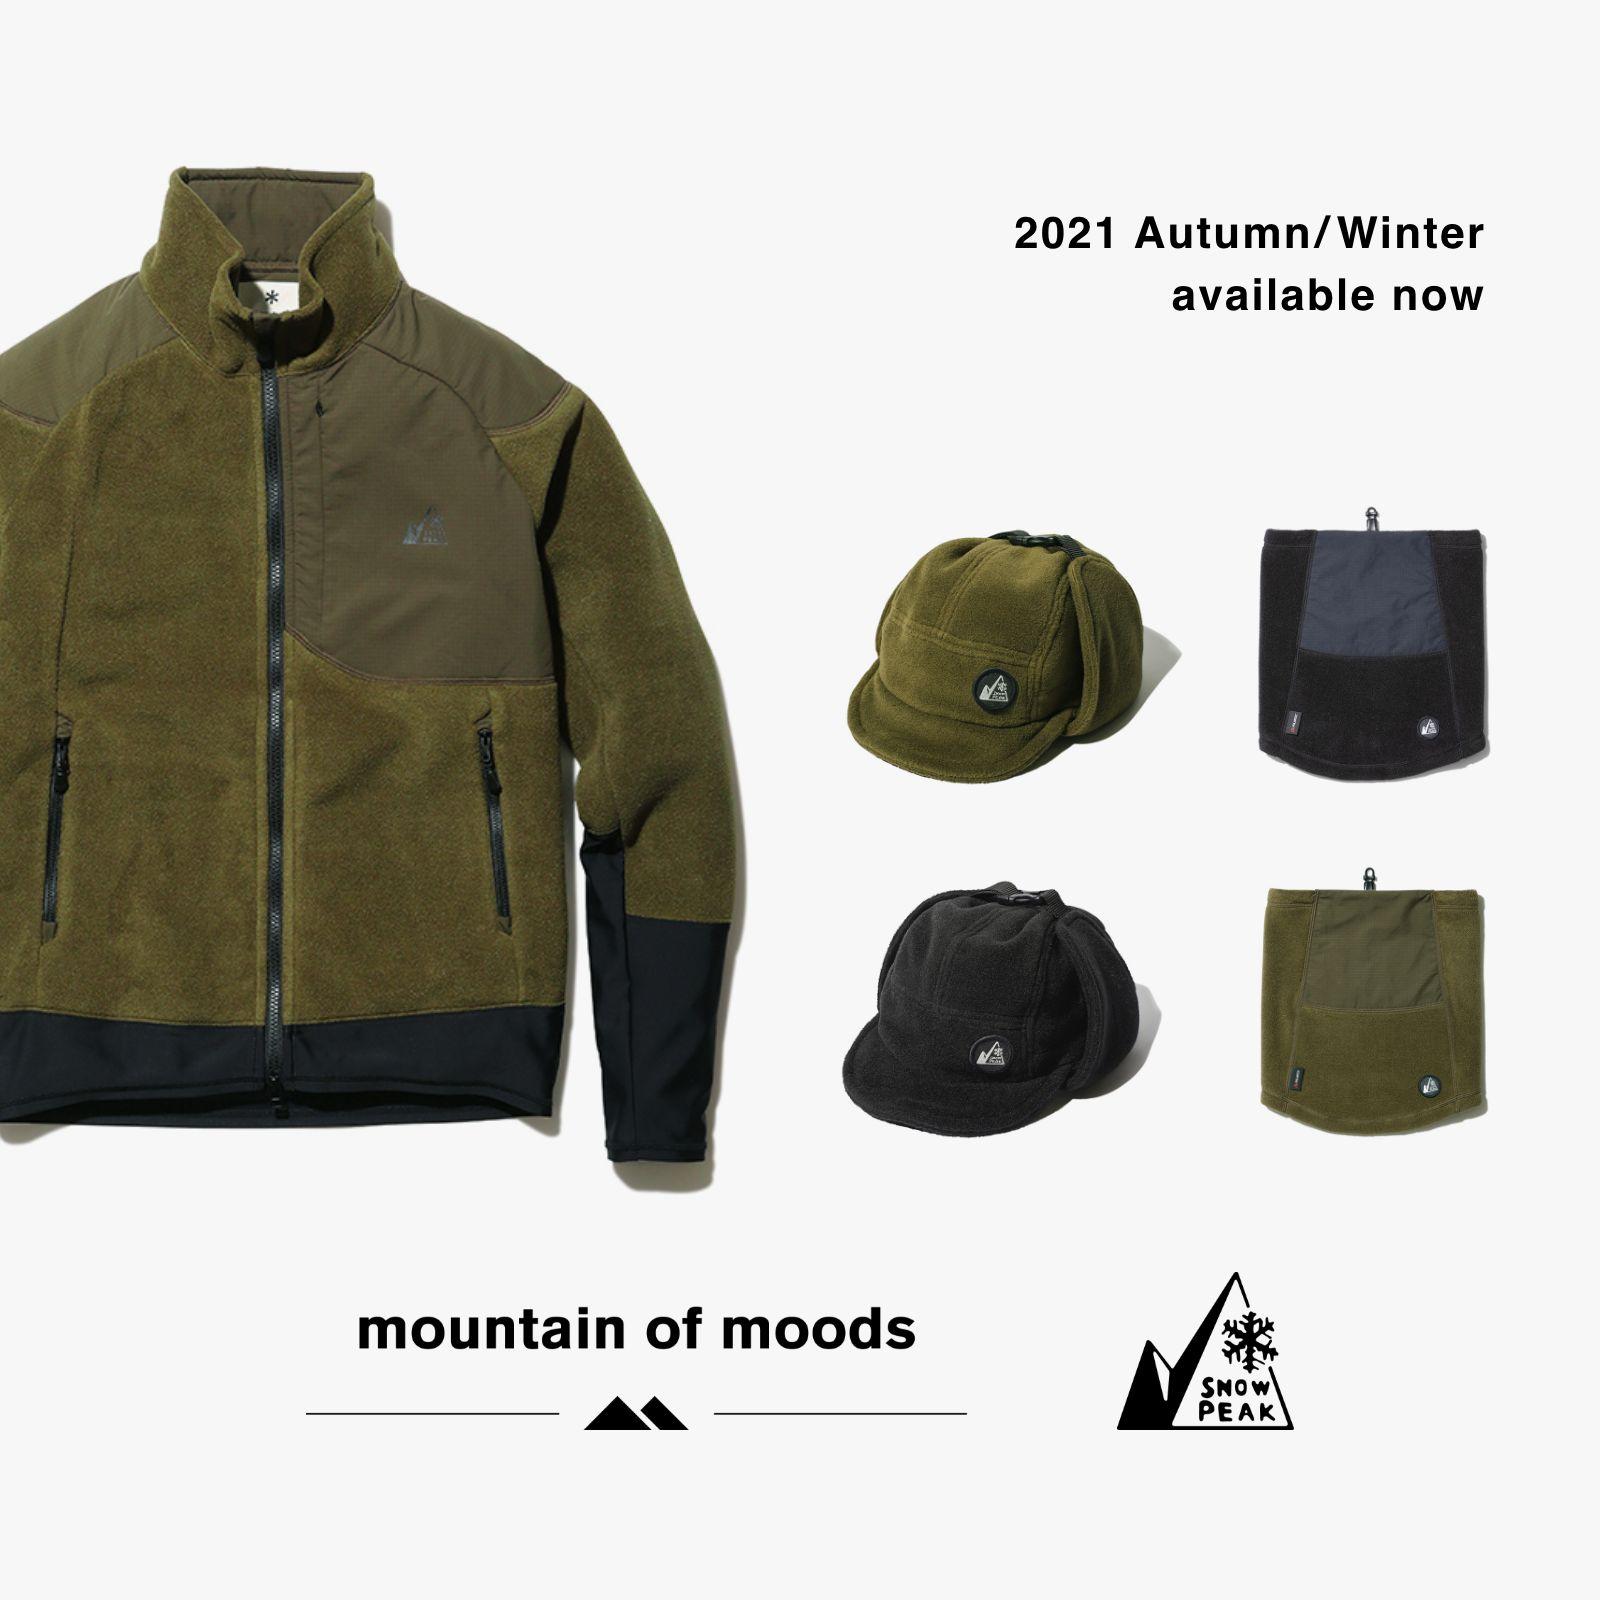 【sp】21FW mountain of moods x SP